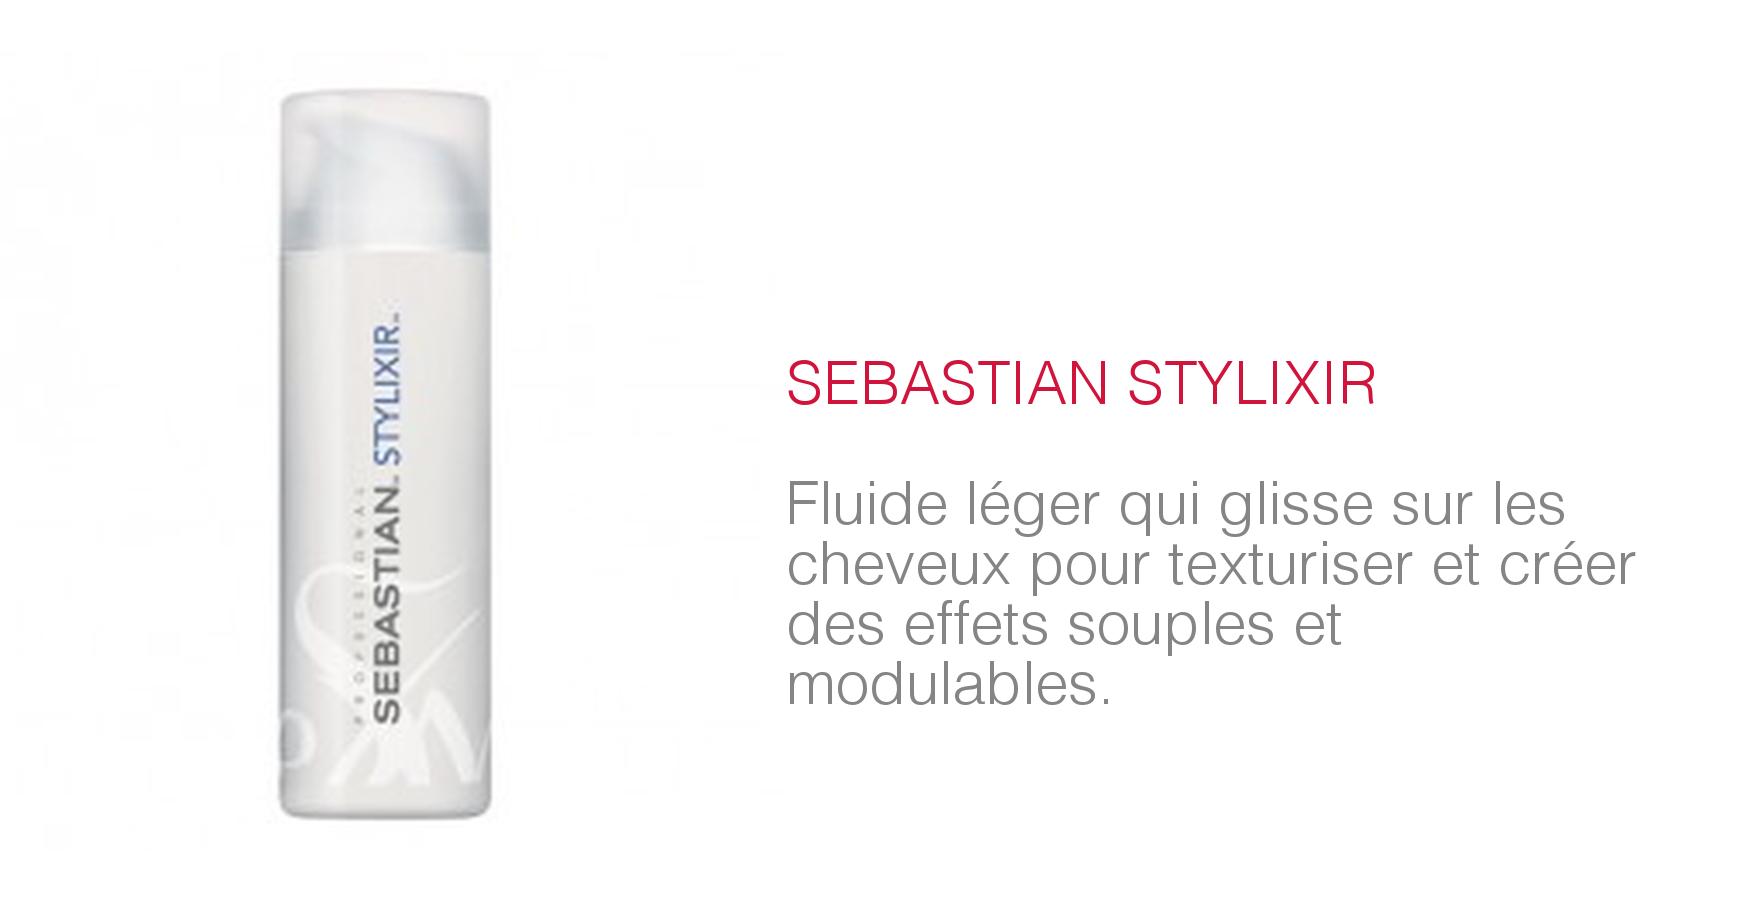 Stylixir